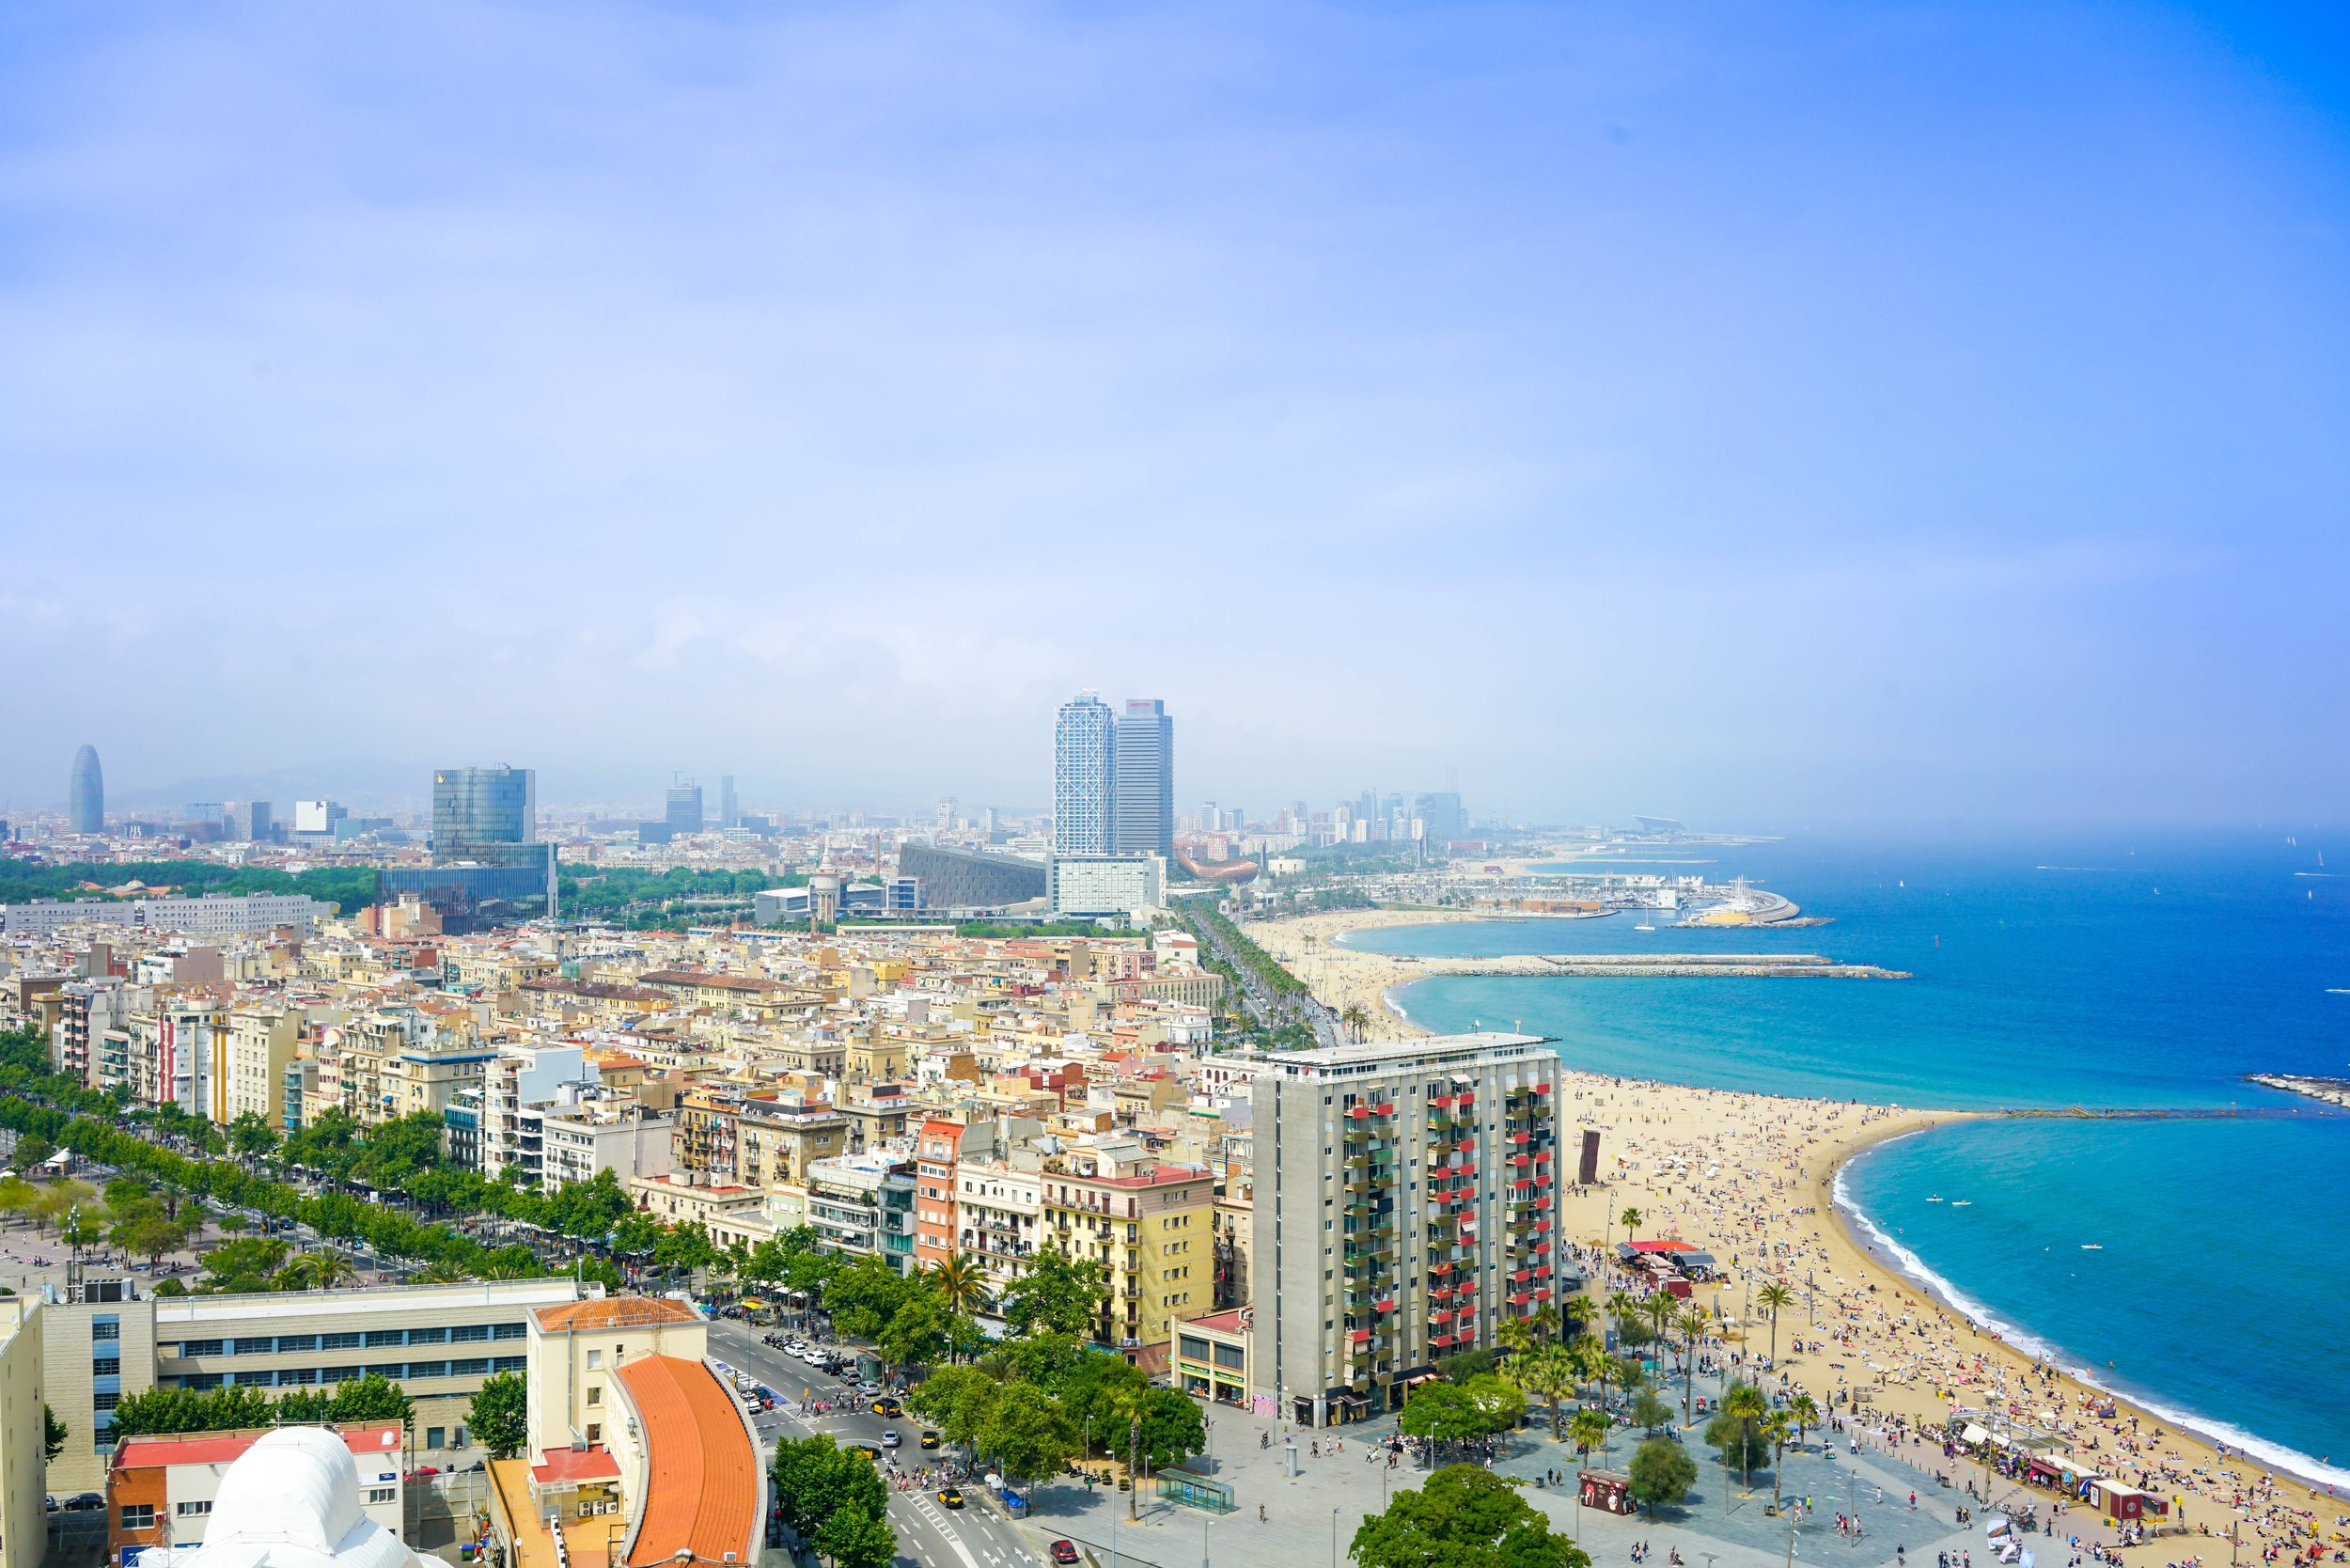 BARCELONA, SPAIN - MAY - JUL 2019